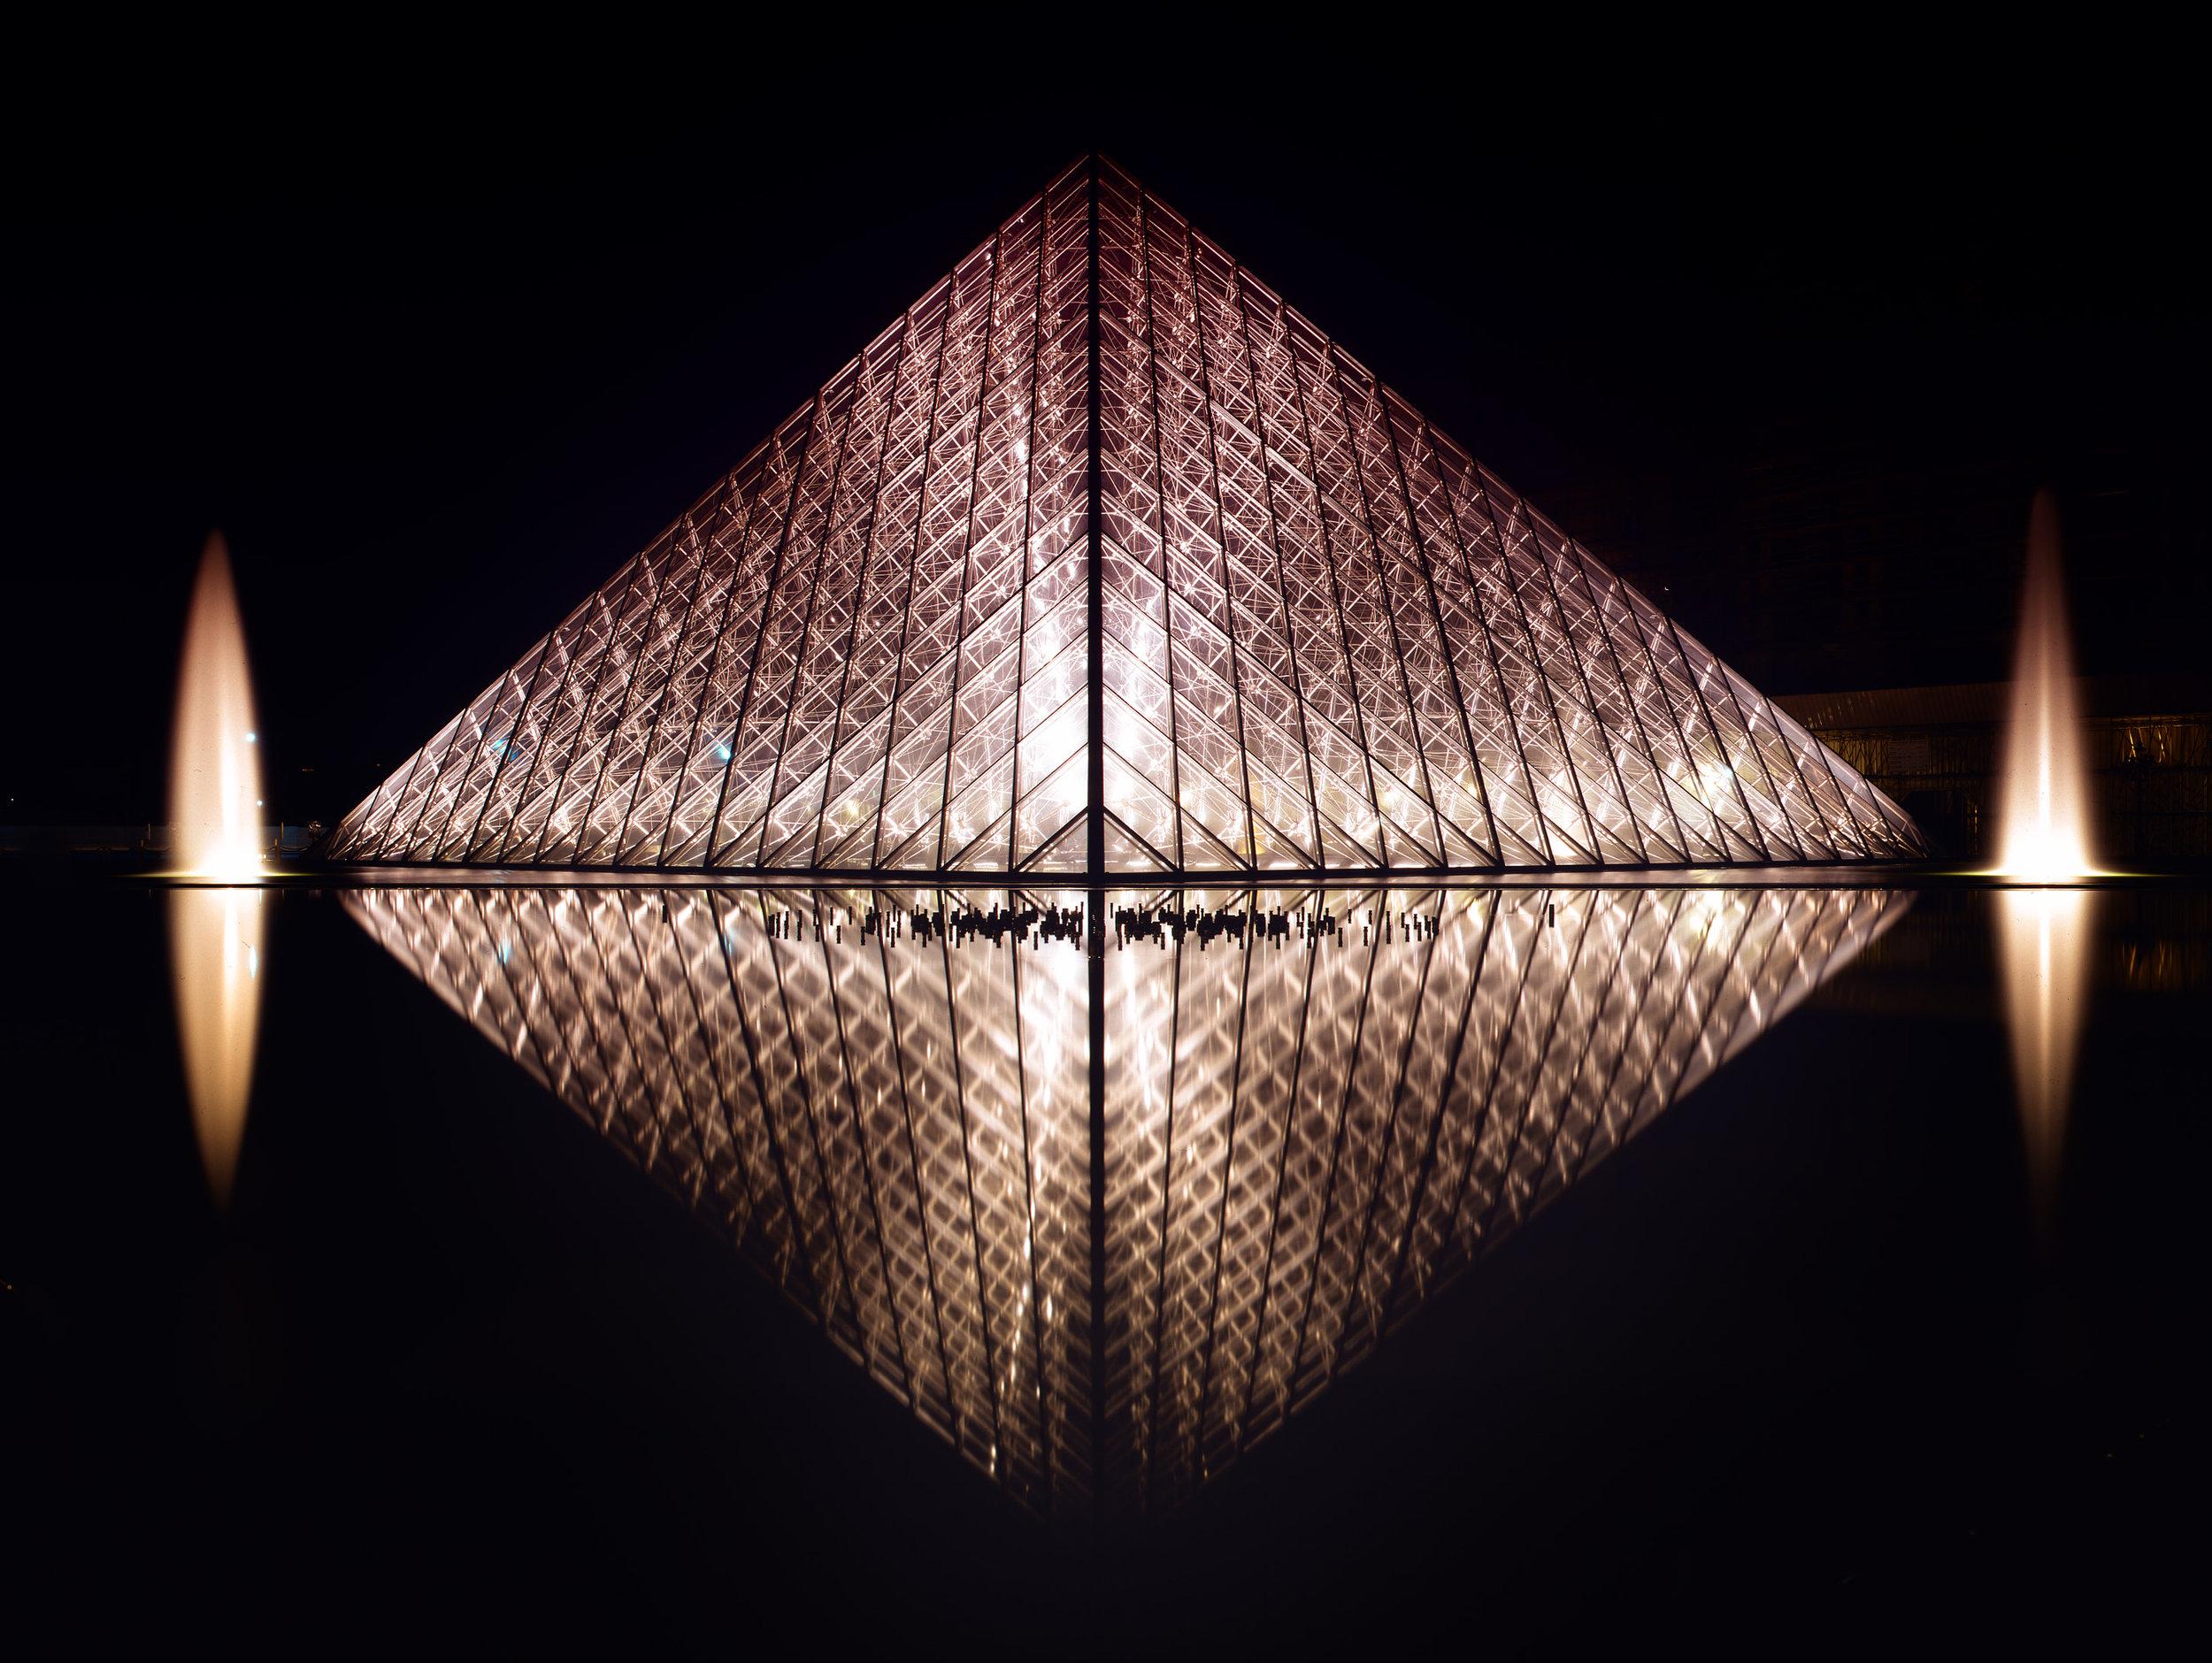 Pyramide du Louvre at Night